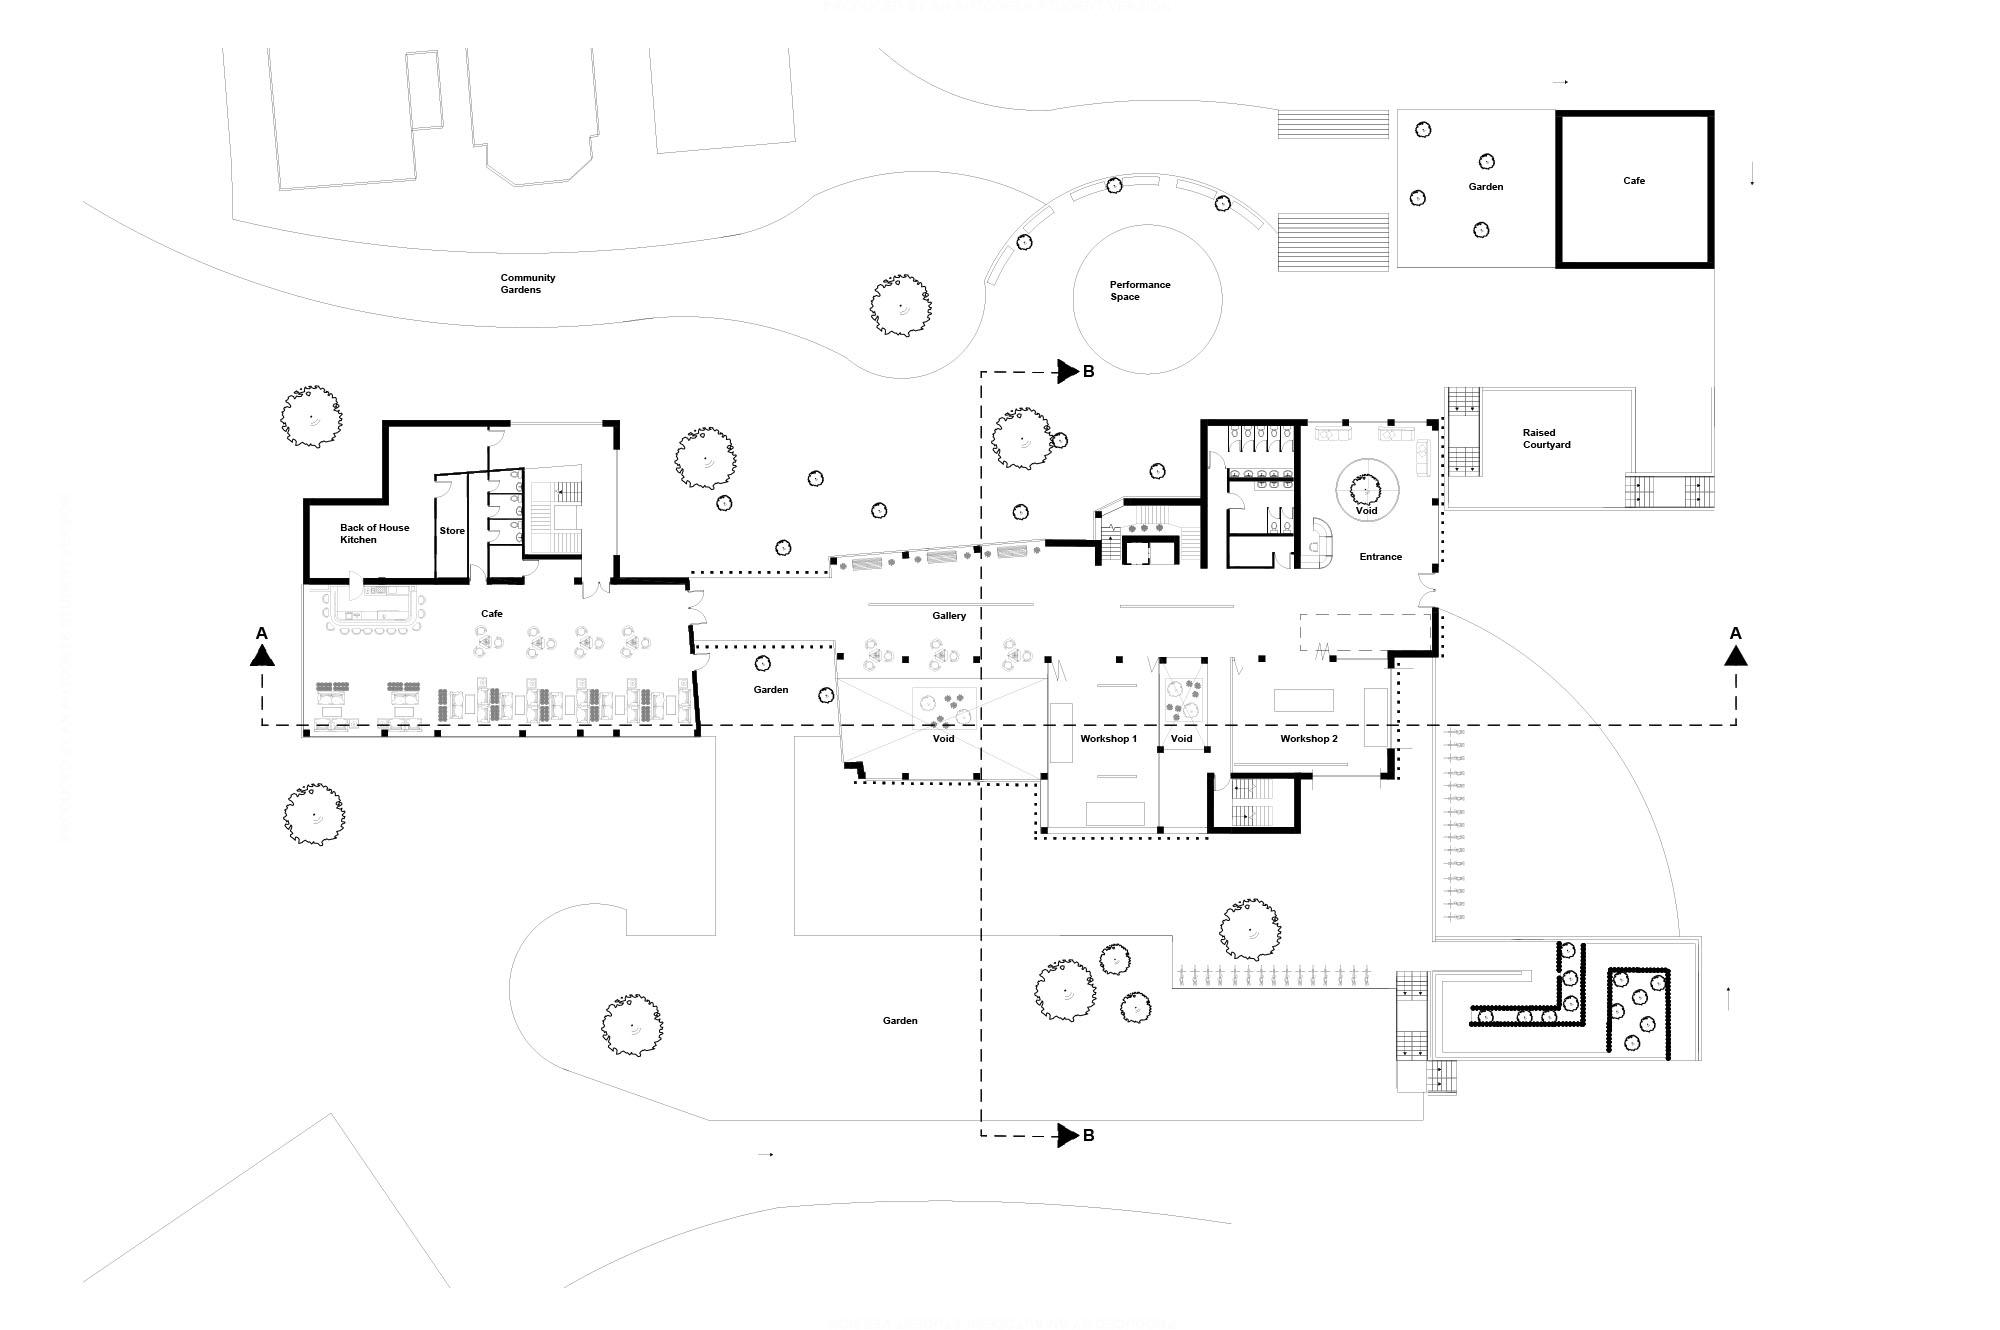 The Engine First Floor Plan